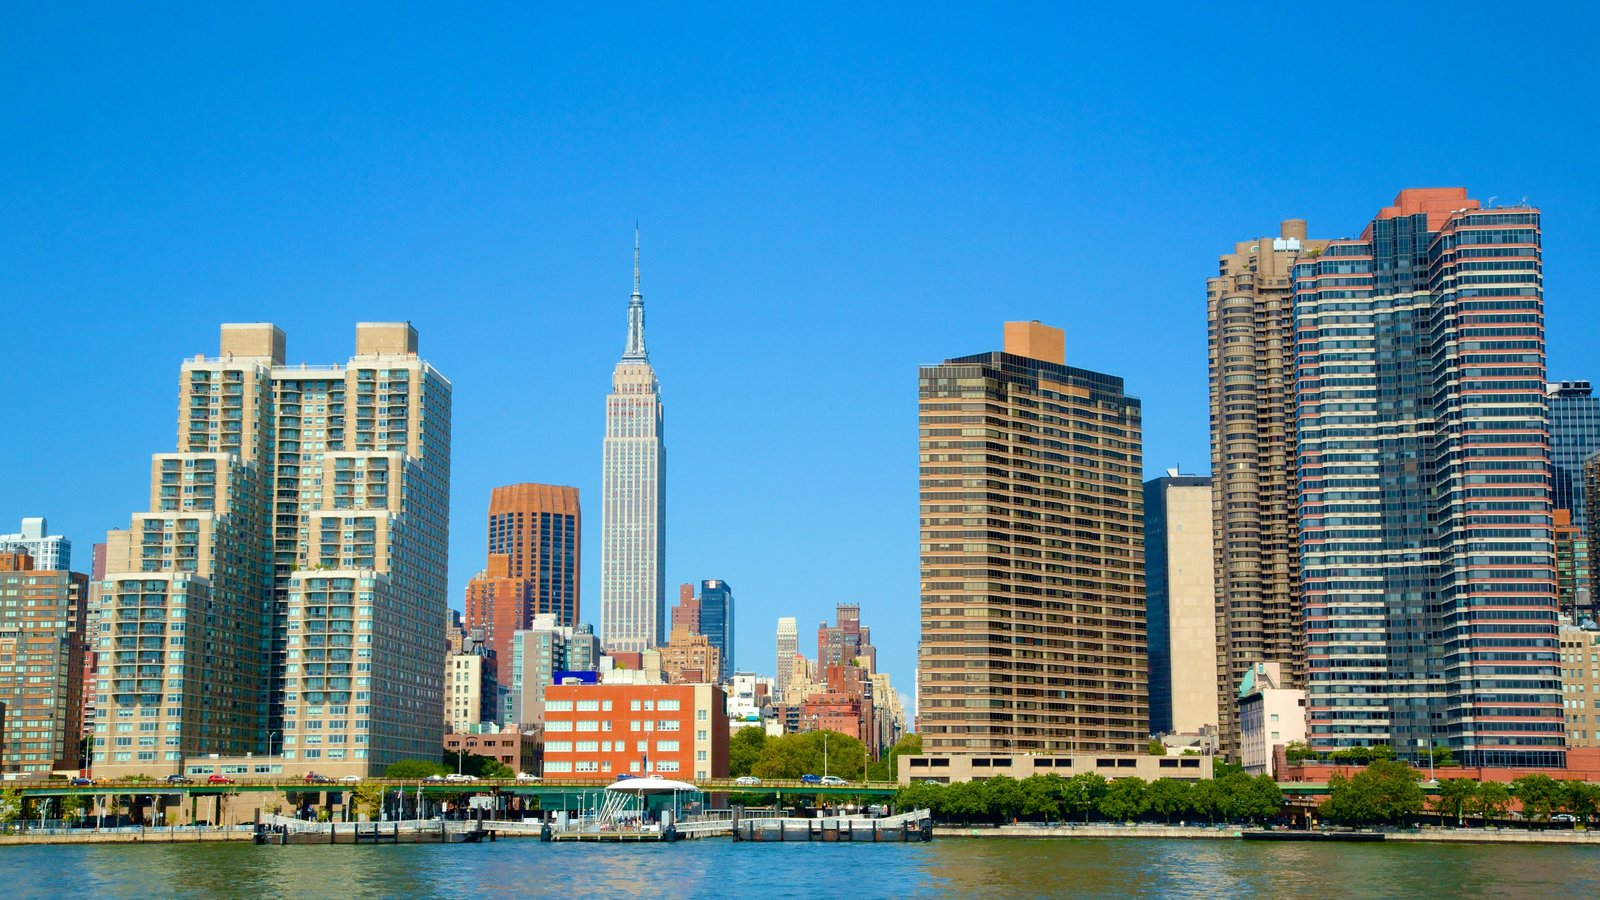 Midtown caracterizando uma cidade